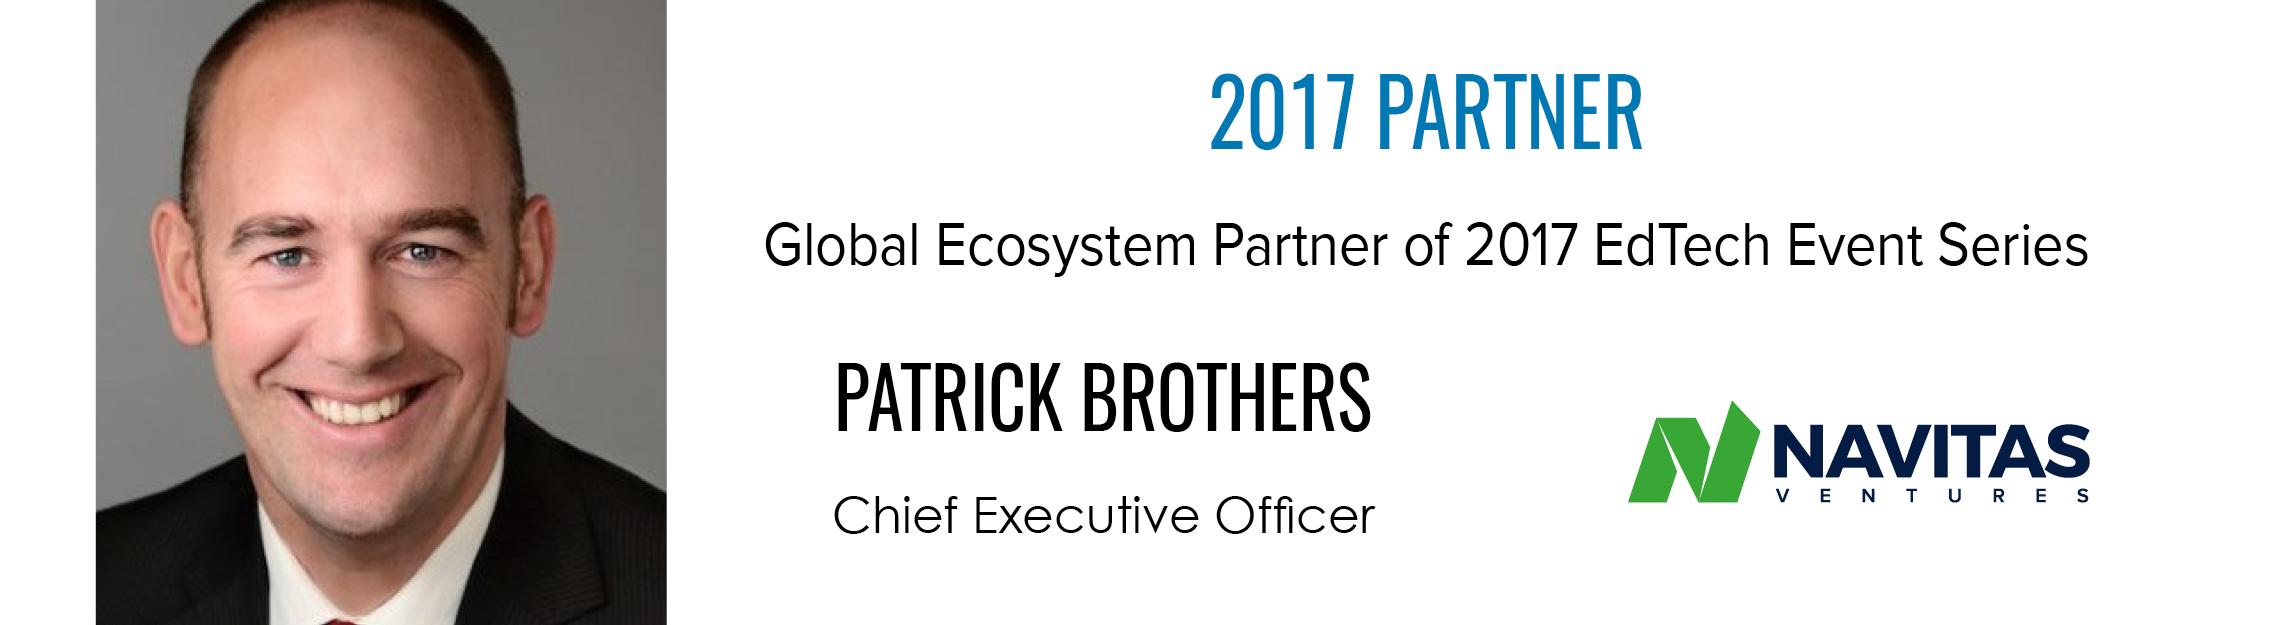 Patrick Brothers_Navitas Ventures-1.png